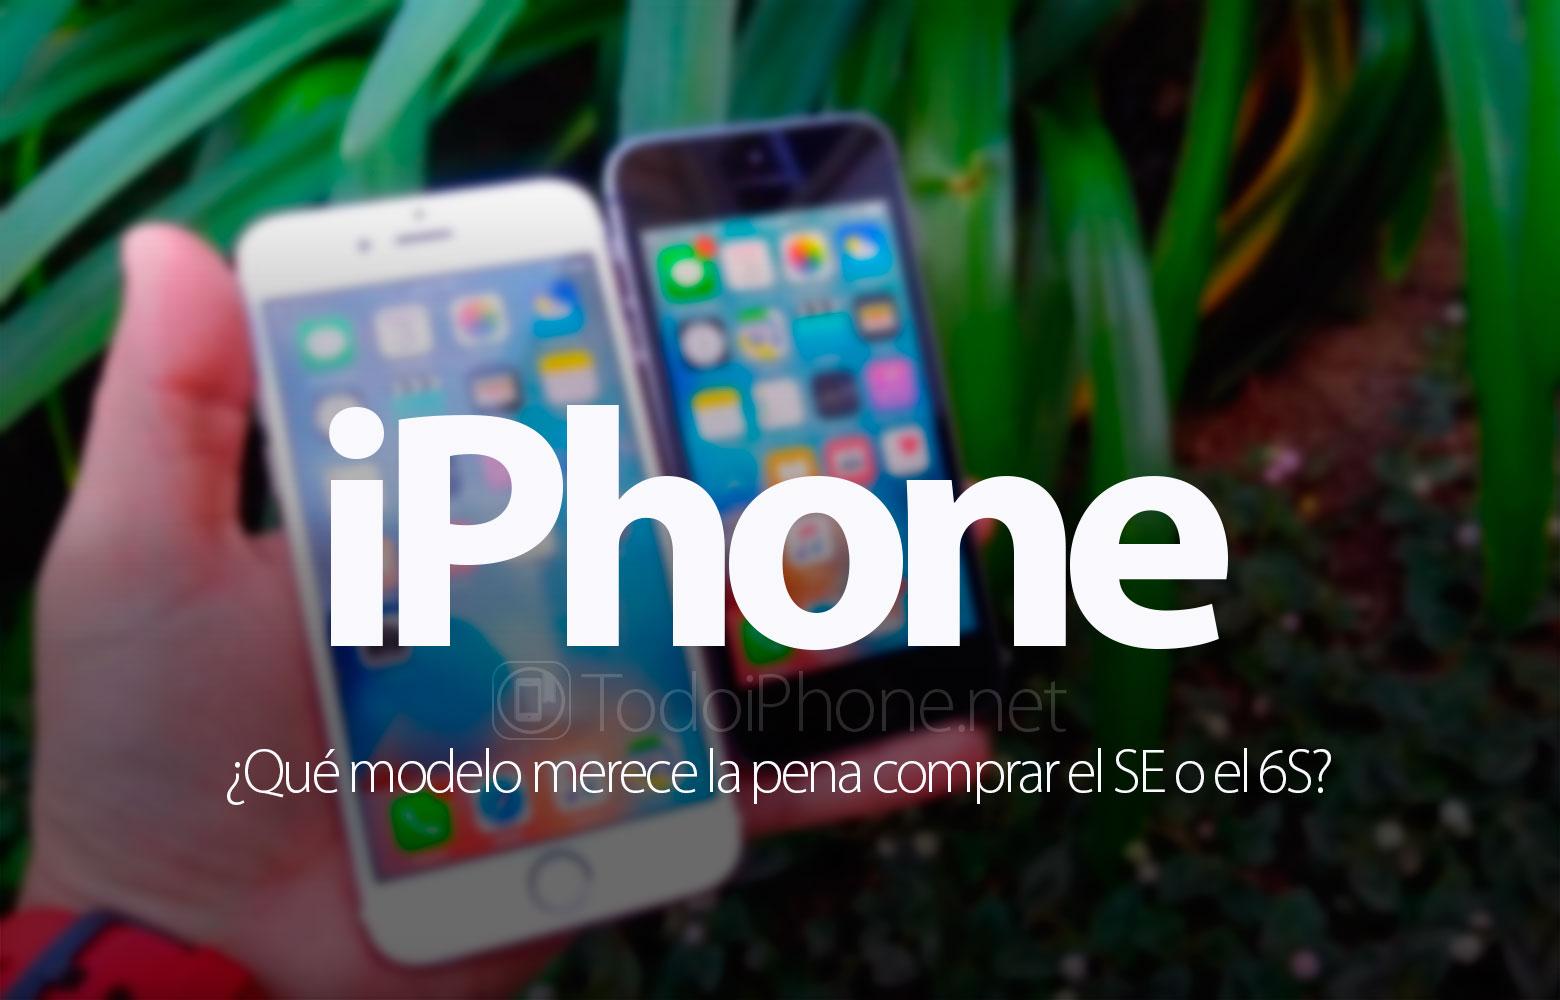 iphone-se-vs-iphone-6s-cual-comprar